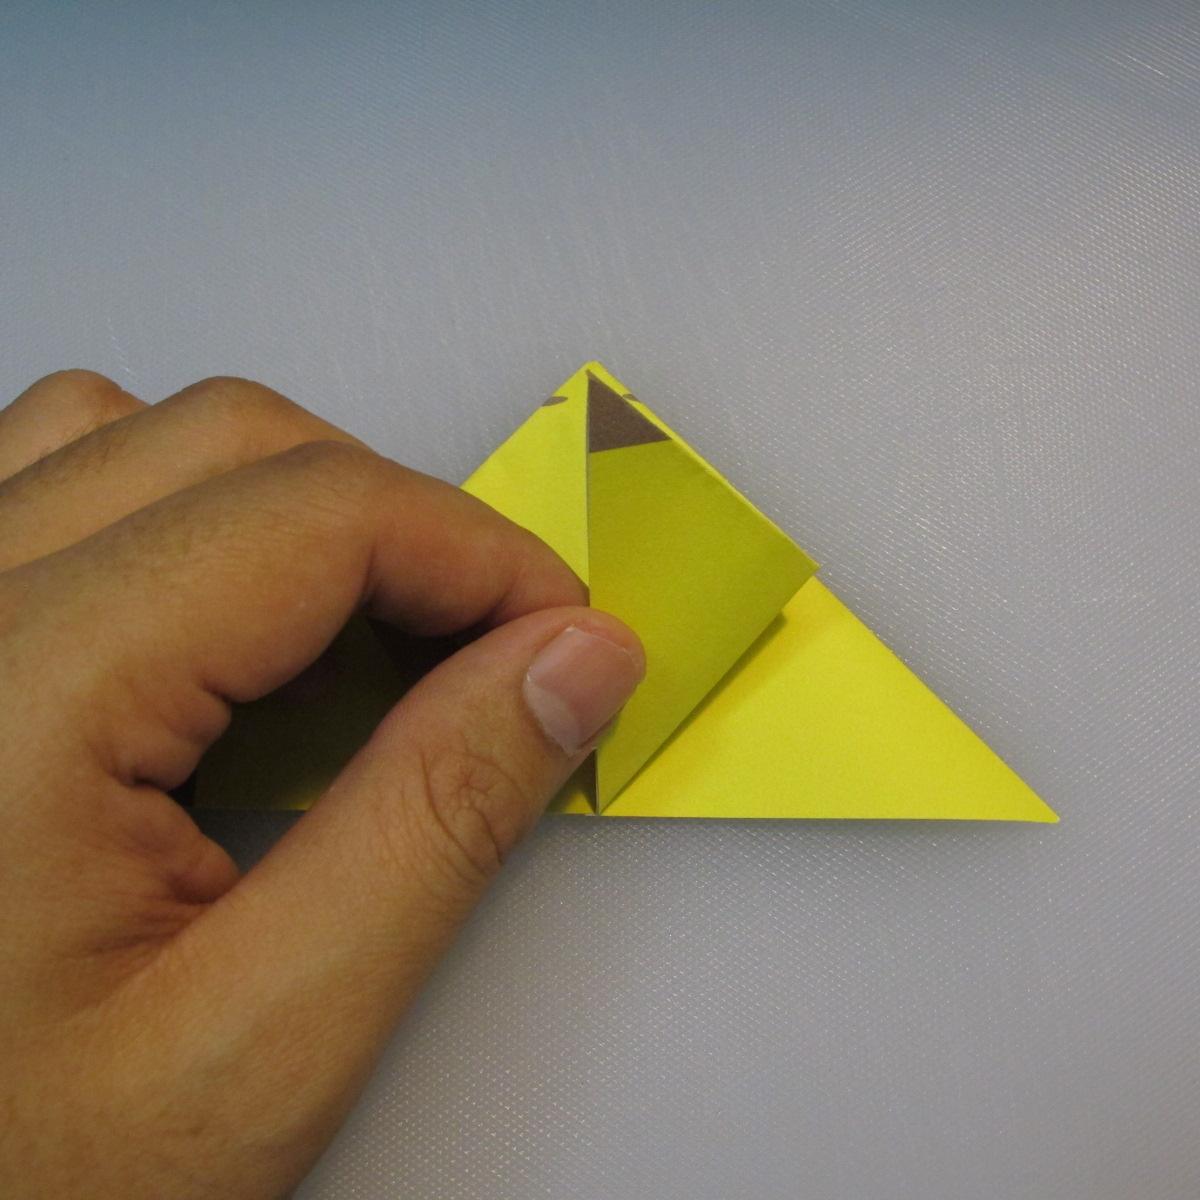 mookeep-วิธีพับกระดาษเป็นรูปปิกาจู-01-006